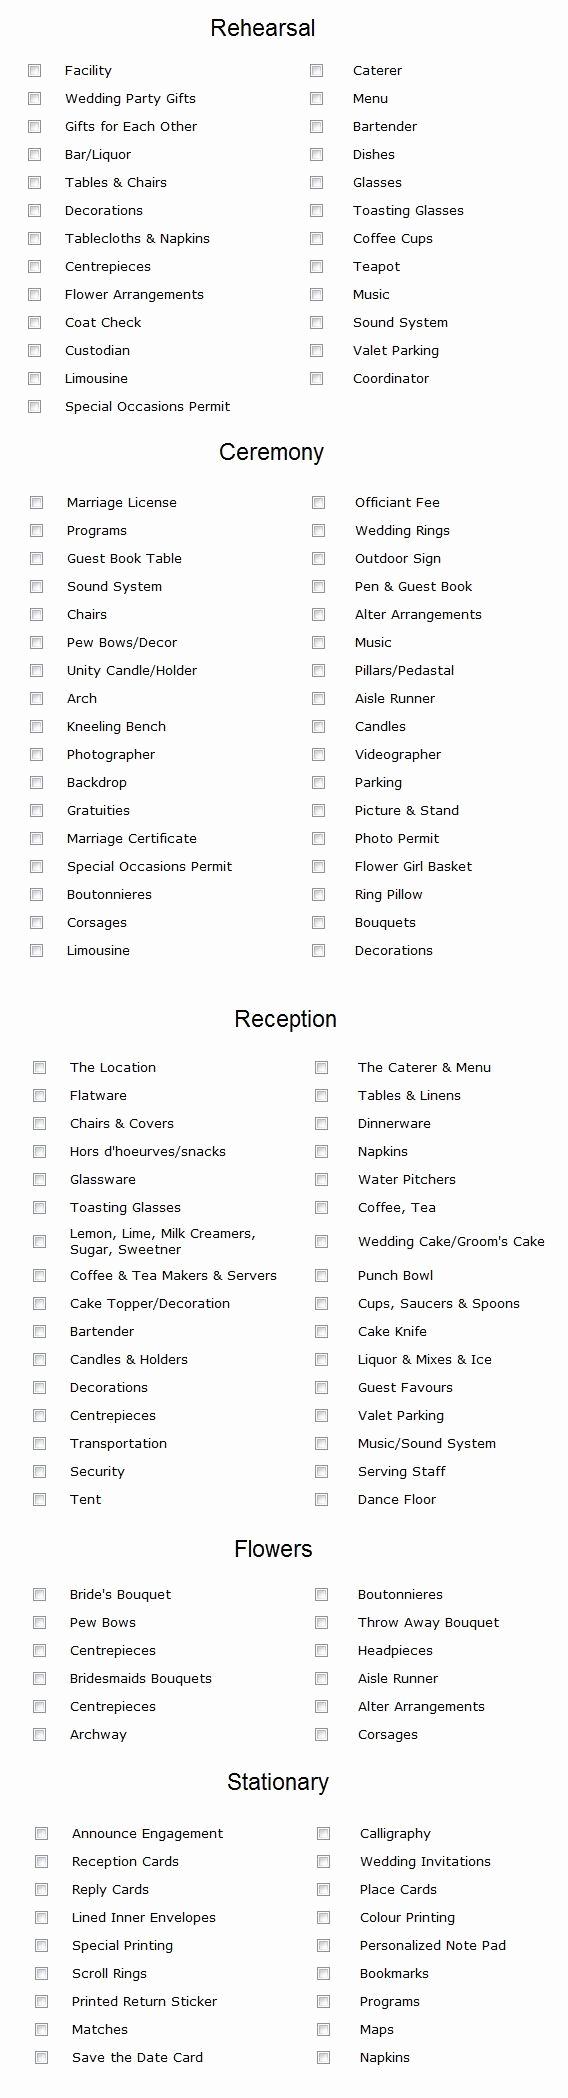 Simple Wedding Ceremony Outline Fresh 25 Best Ideas About Wedding Ceremony Outline On Pinterest